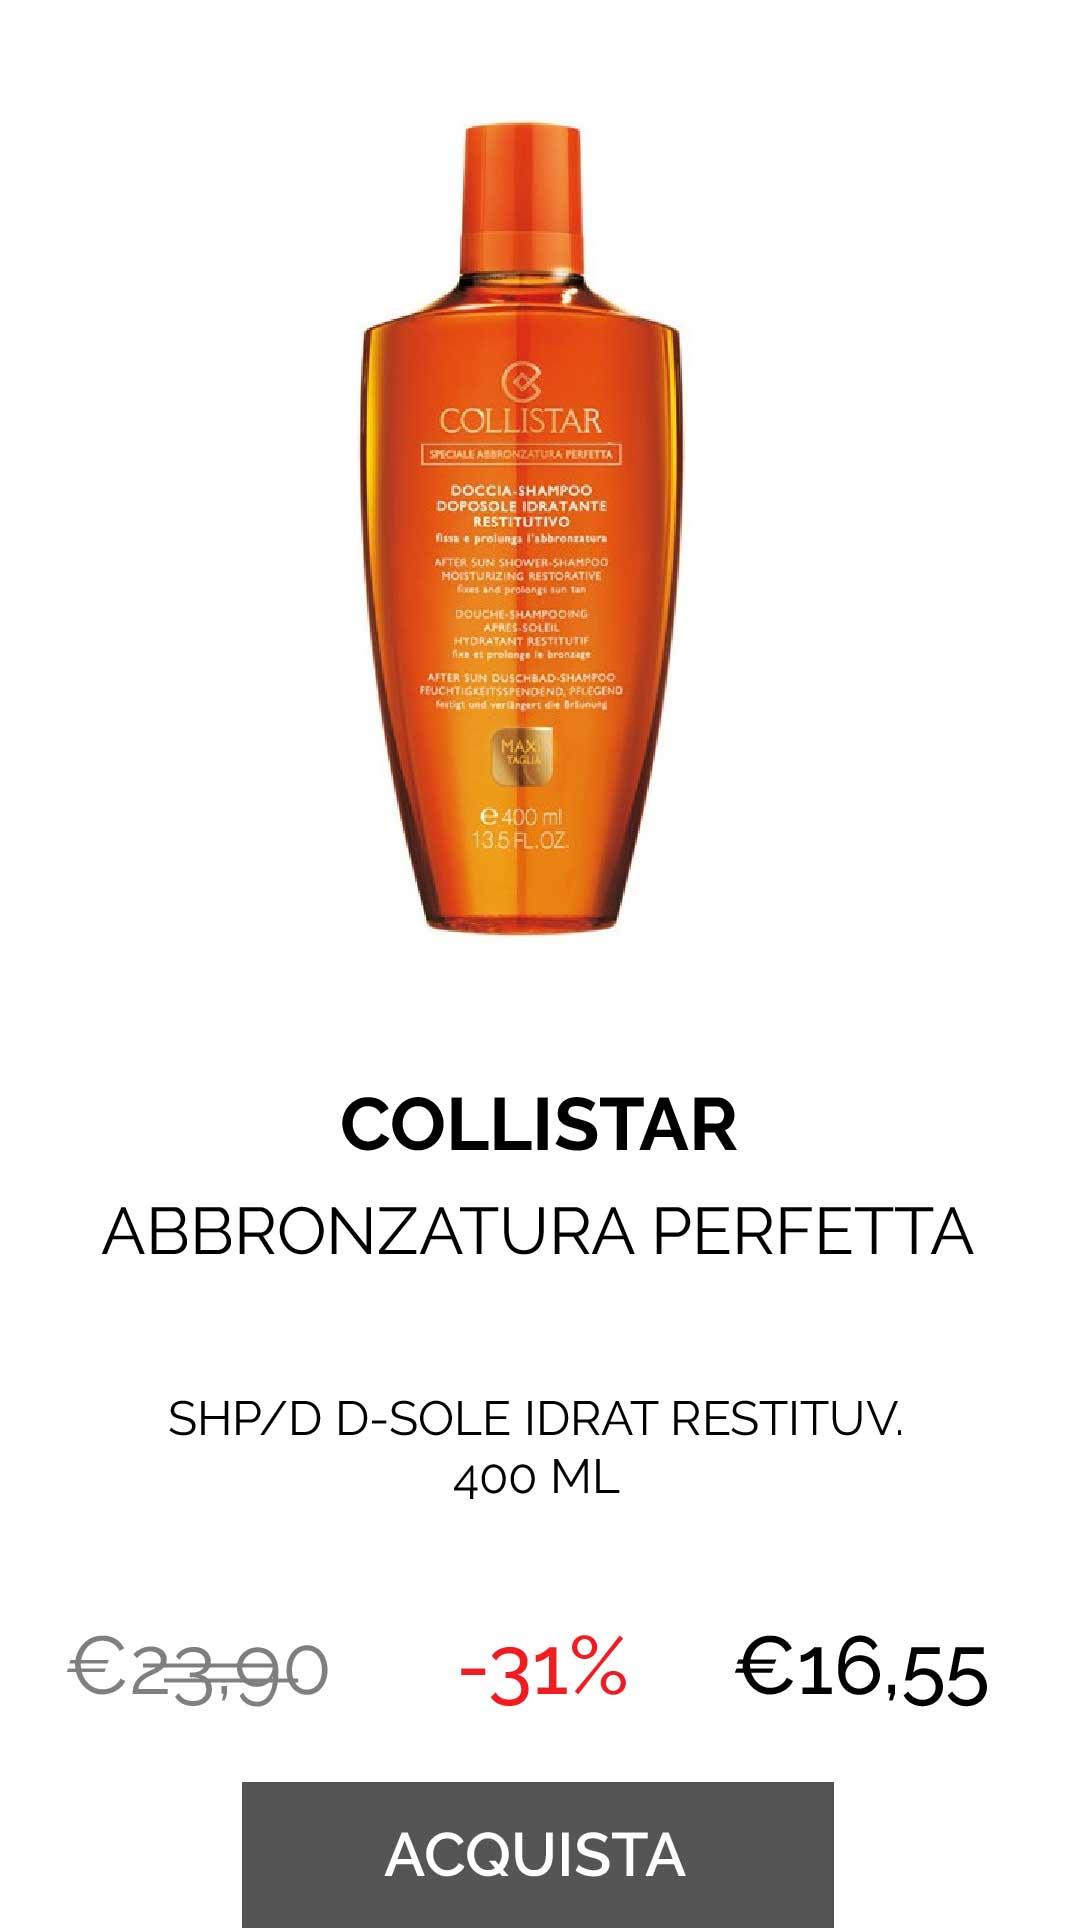 Collistar - SHP/D D-SOLE IDRAT RESTITUV. 400 ML